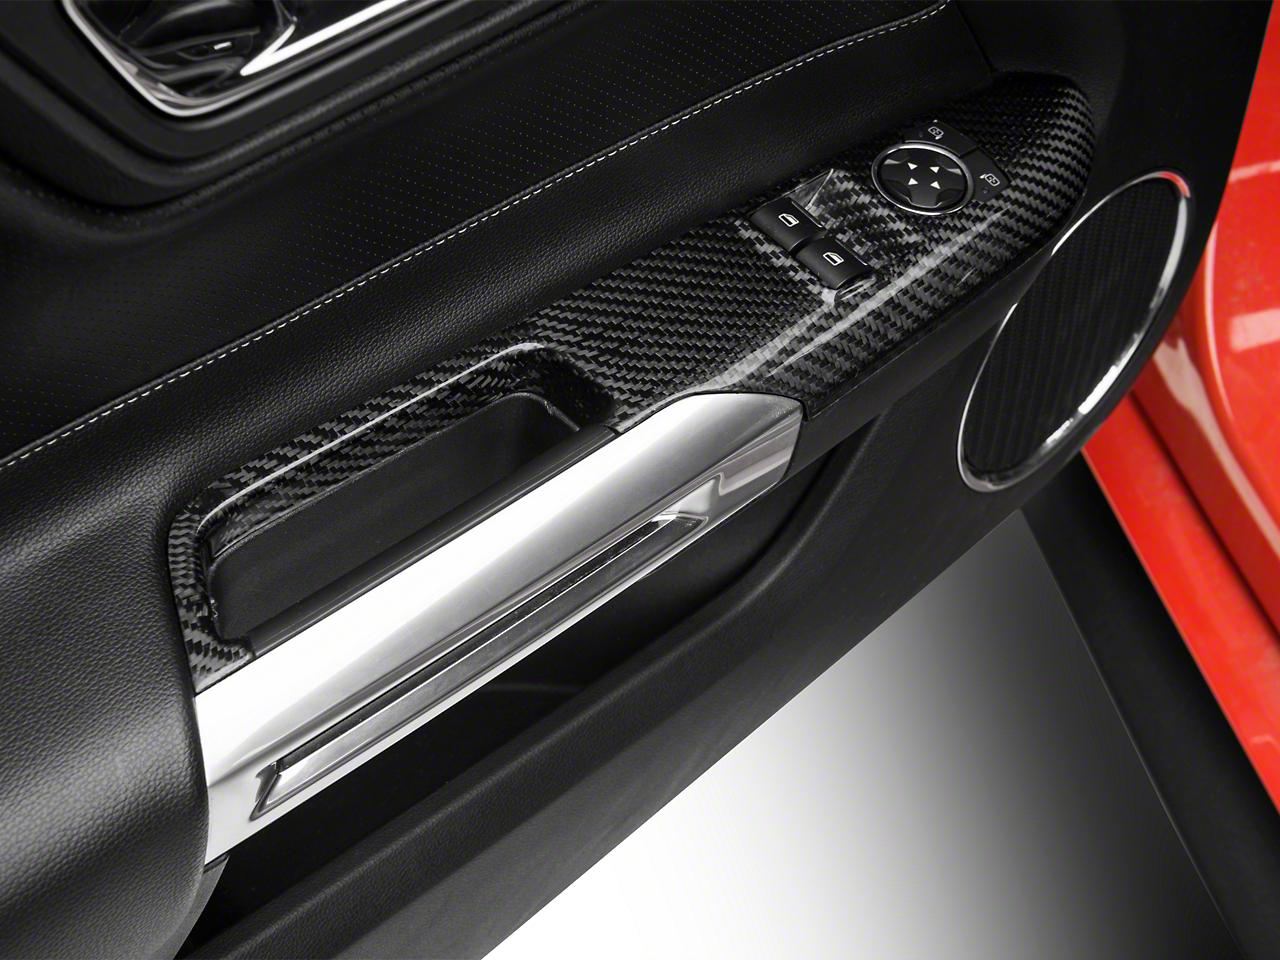 Trufiber Carbon Fiber Window Switch Covers (15-17 GT, EcoBoost, V6)